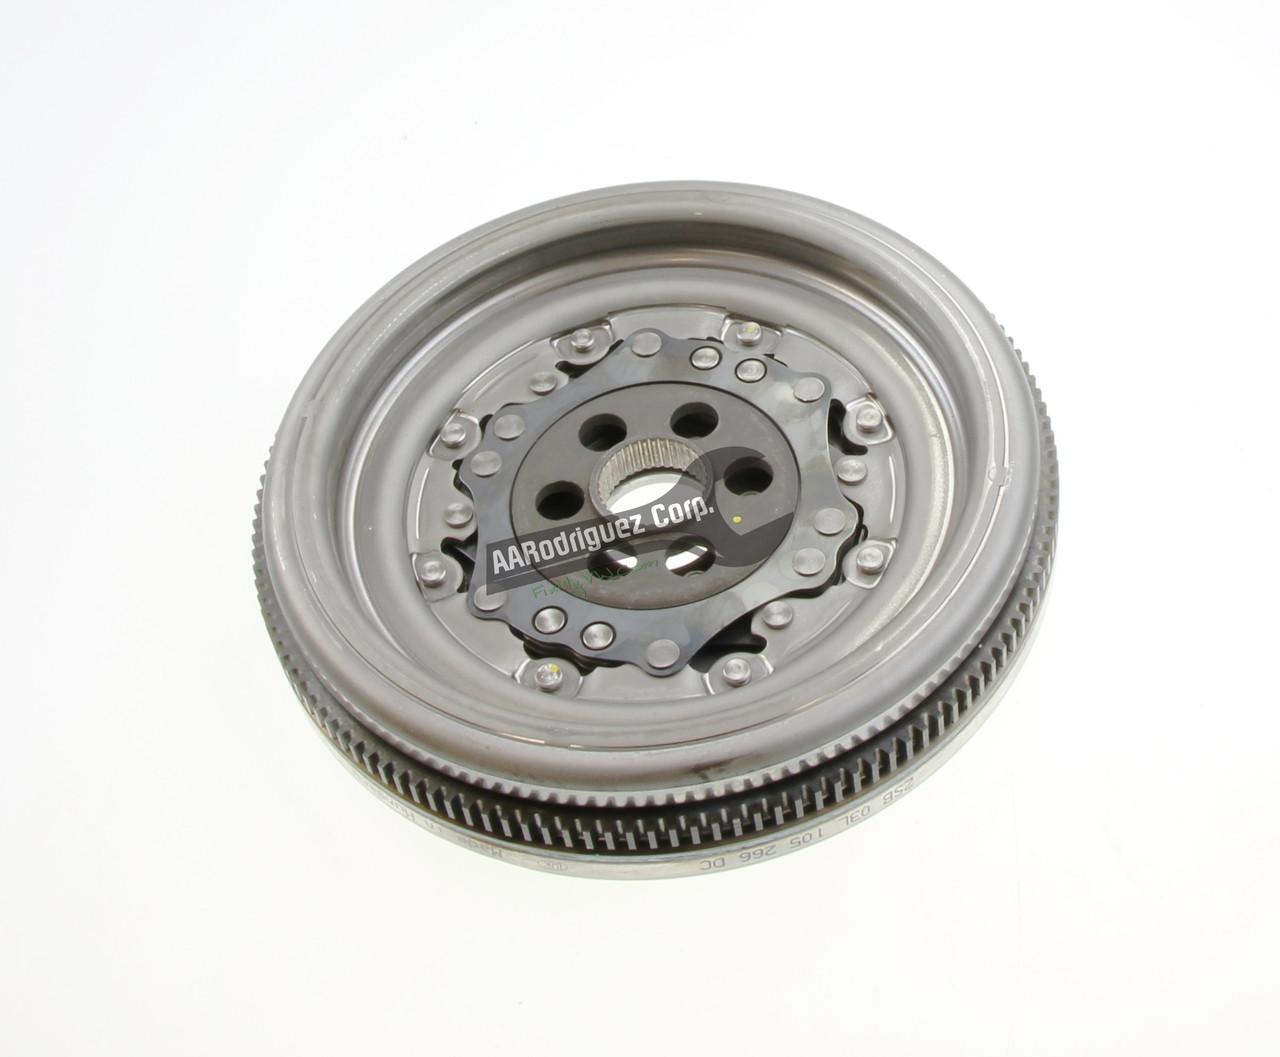 2009+ DSG flywheel by LUK (03L105266DC)